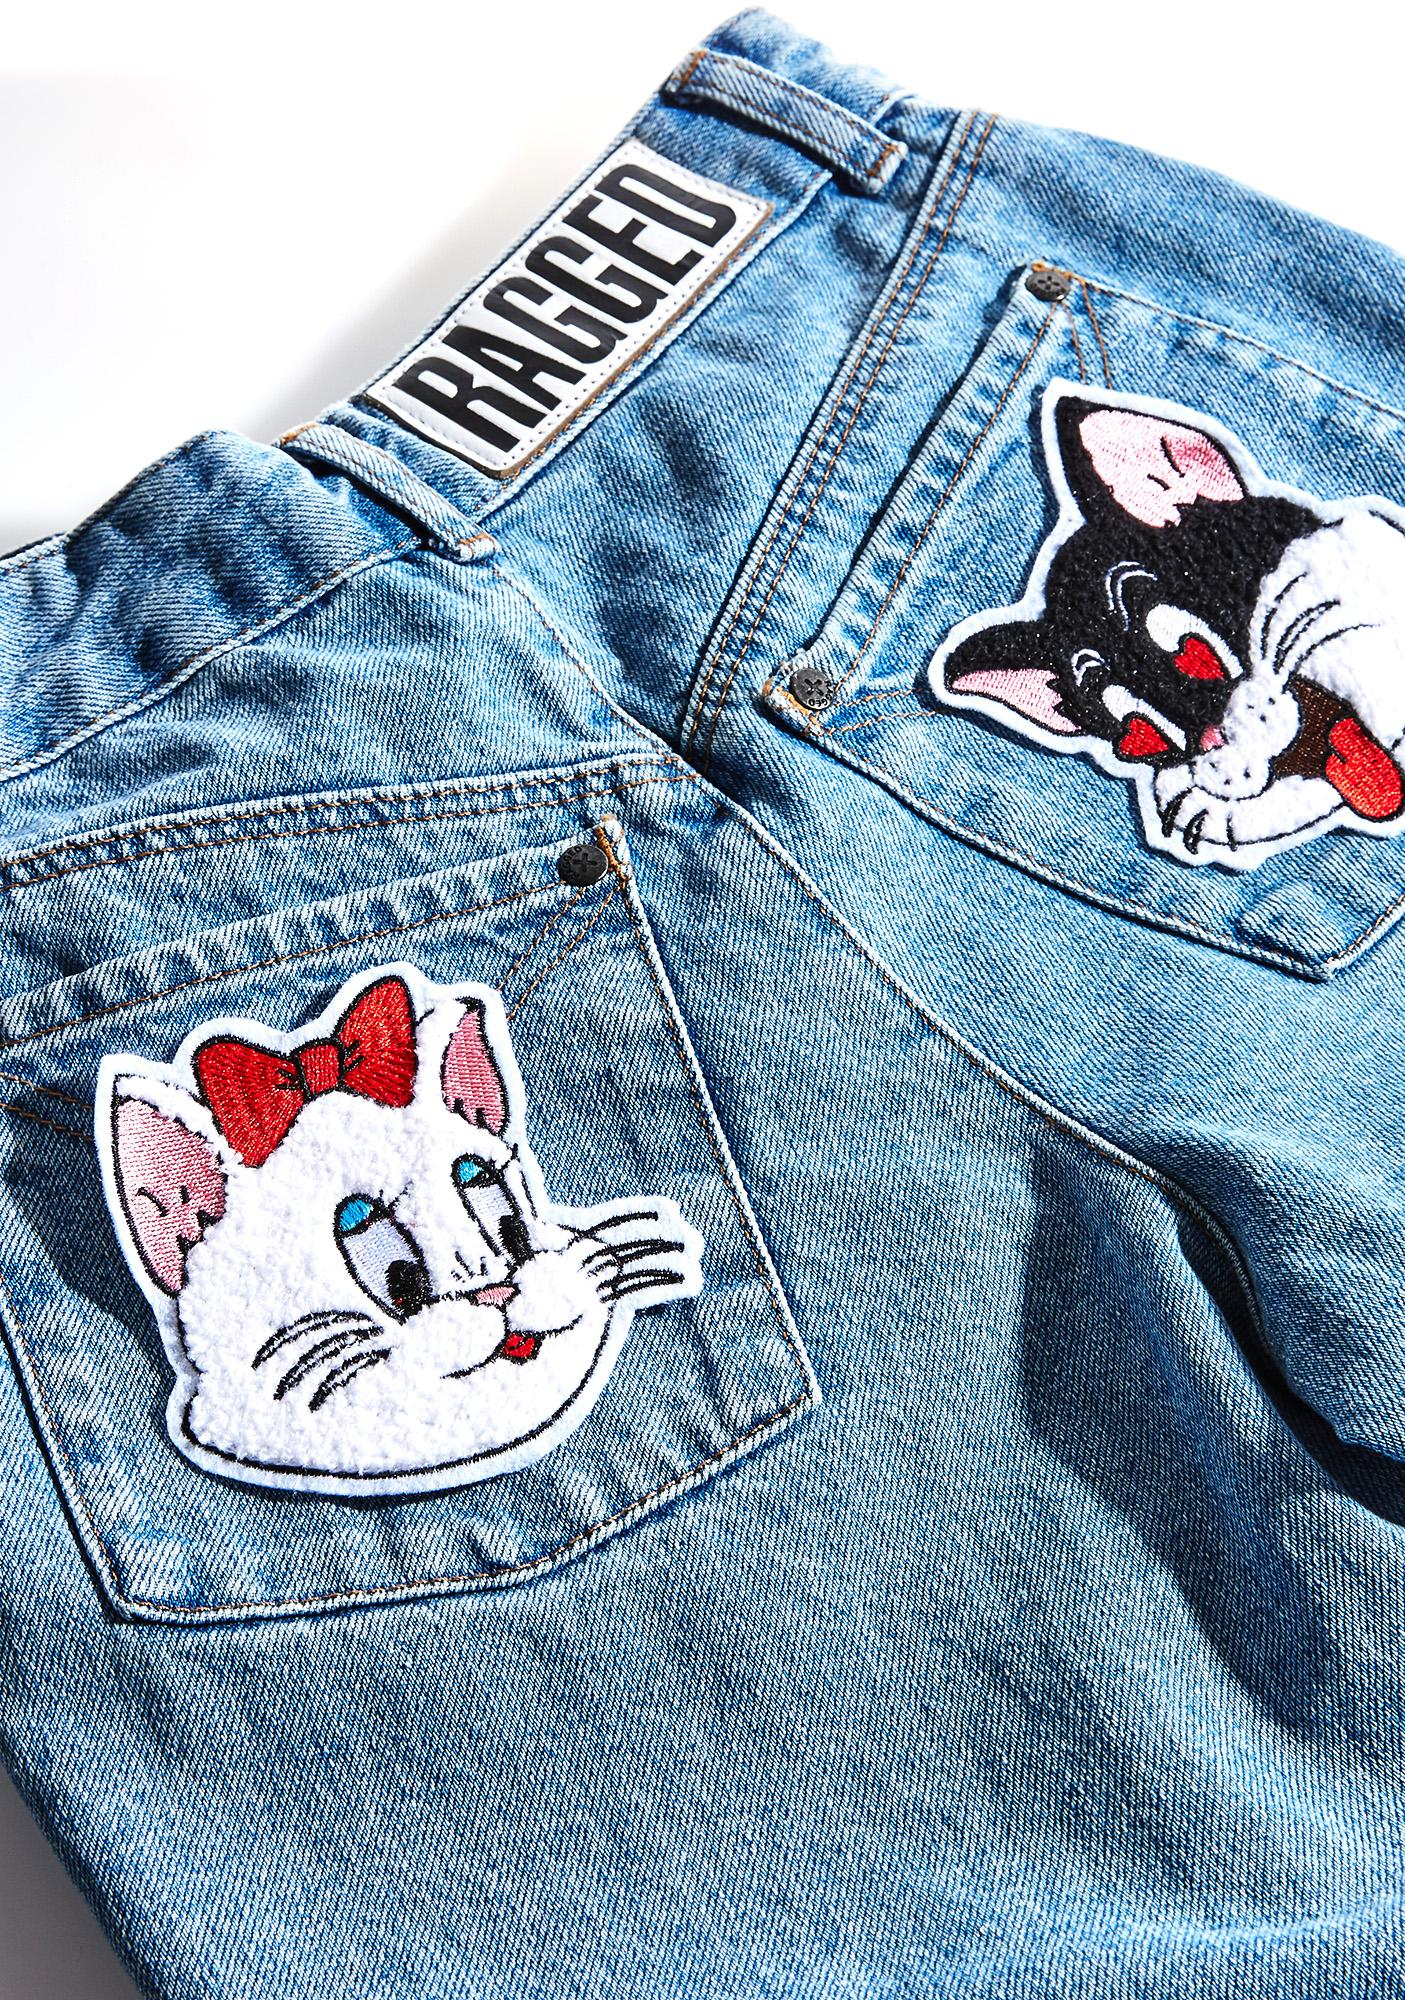 Rosehound Apparel Love Cats Patch Set